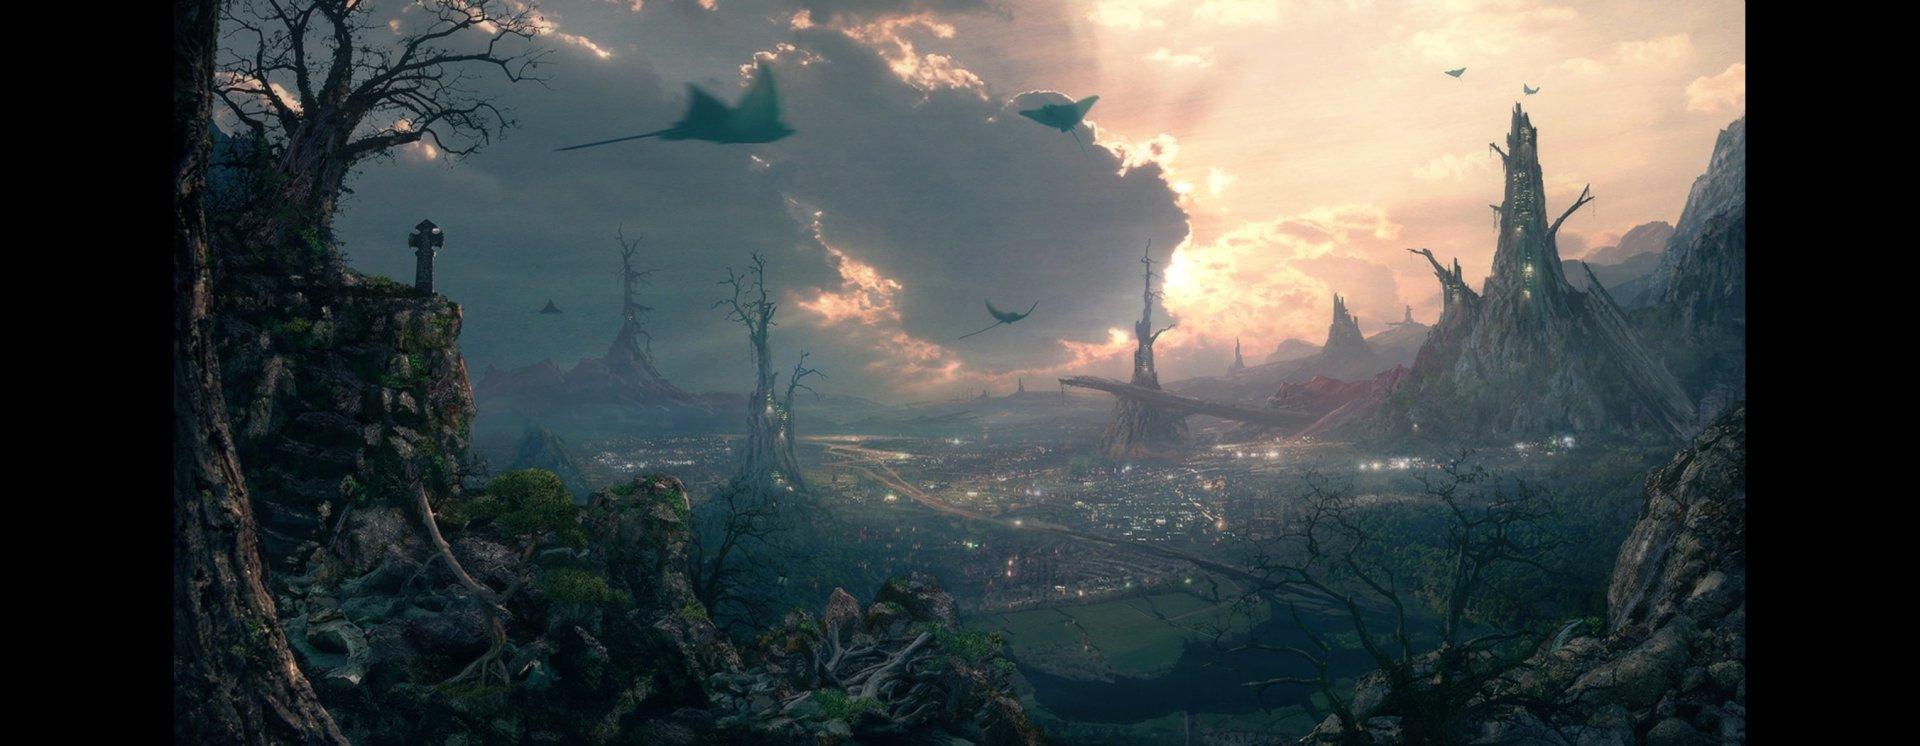 Fantasy - City  Fantasy Landscape Wallpaper